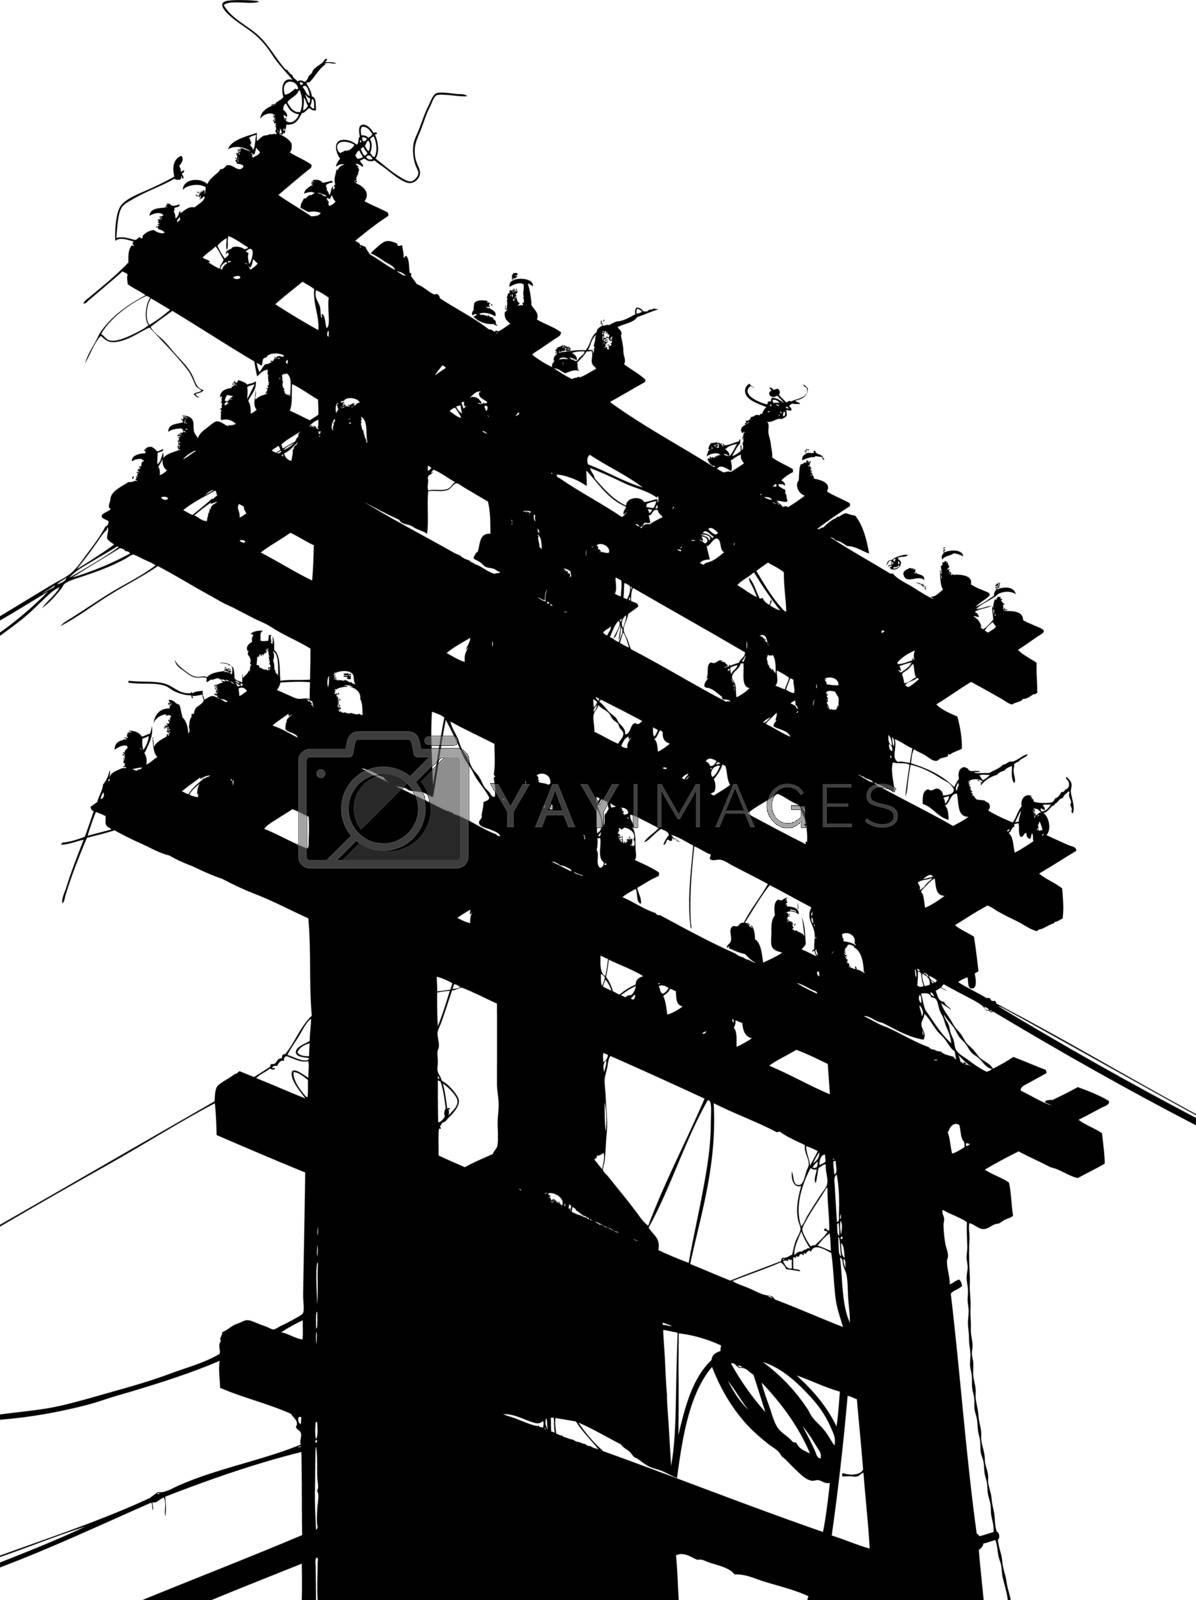 Old decrepit wooden telephone pole on  white background. Vector illustration.